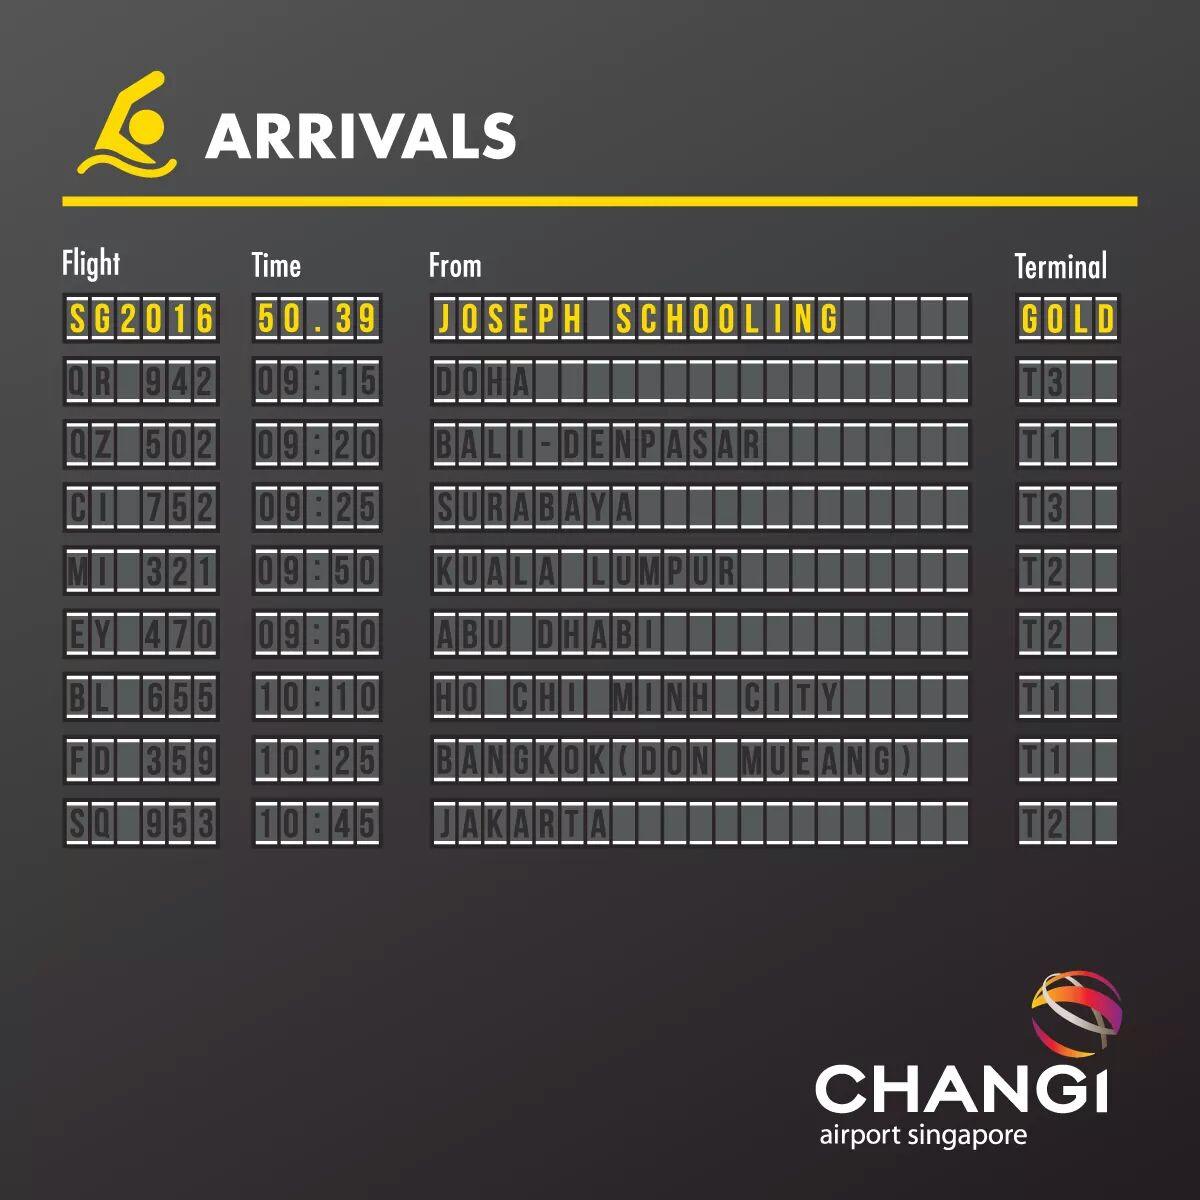 via Facebook / Changi Airport